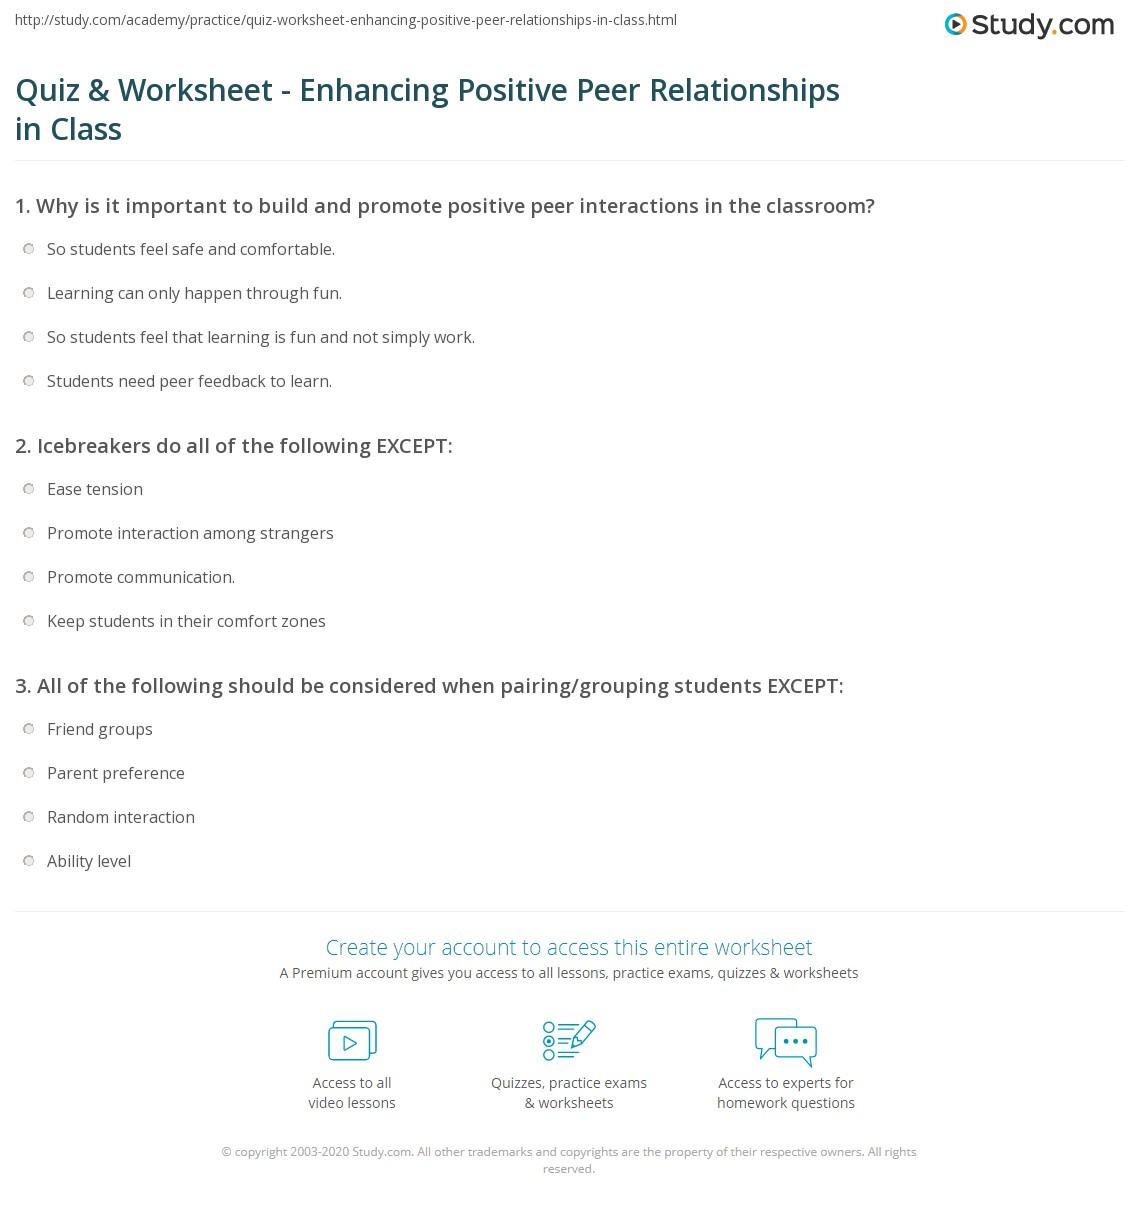 Free Worksheet Icebreaker Worksheets For Adults quiz worksheet enhancing positive peer relationships in class print building promoting the classroom worksheet